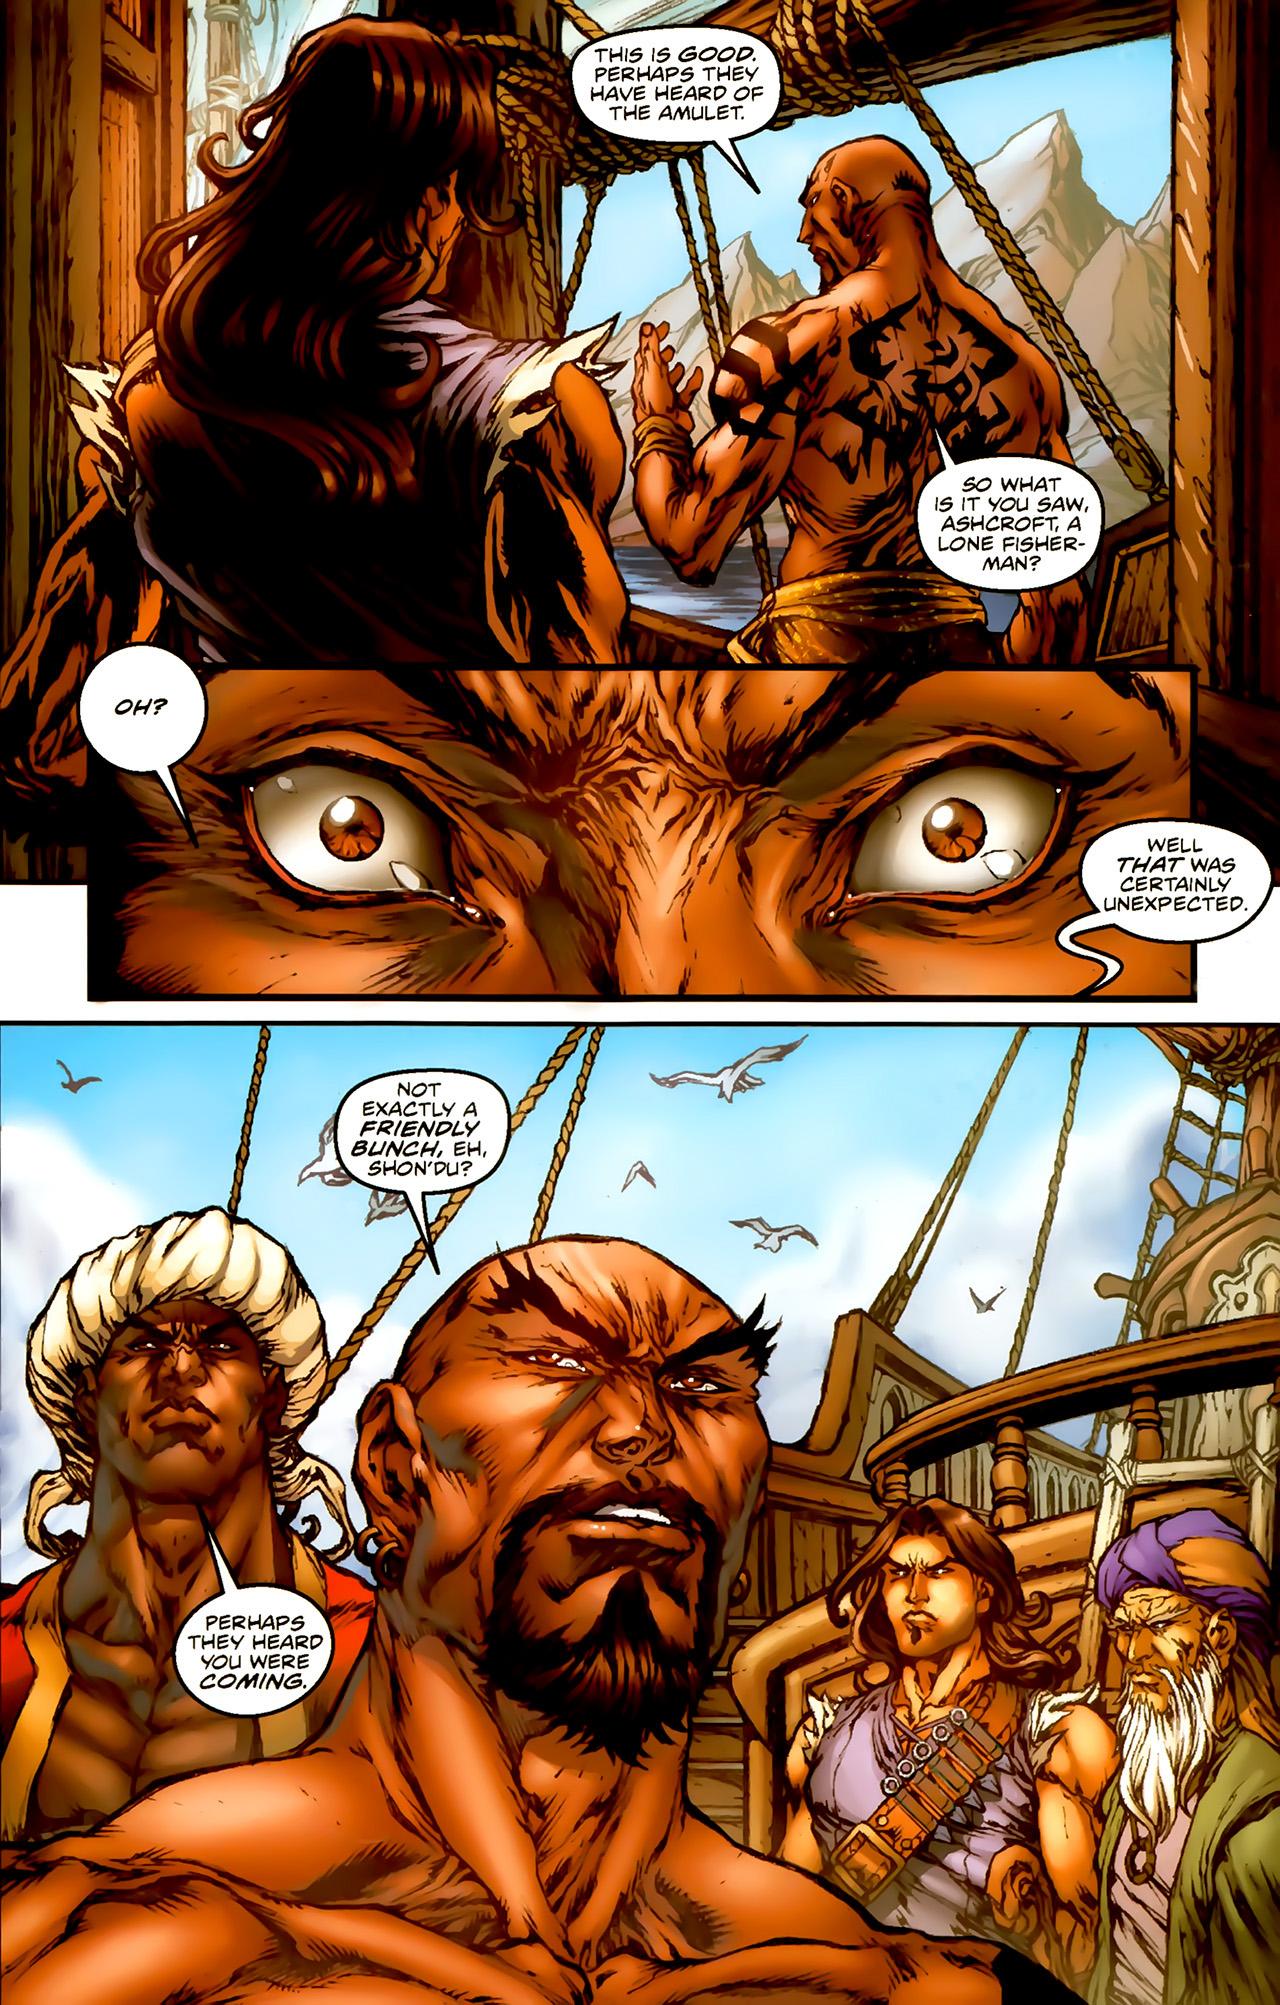 Read online 1001 Arabian Nights: The Adventures of Sinbad comic -  Issue #1 - 8